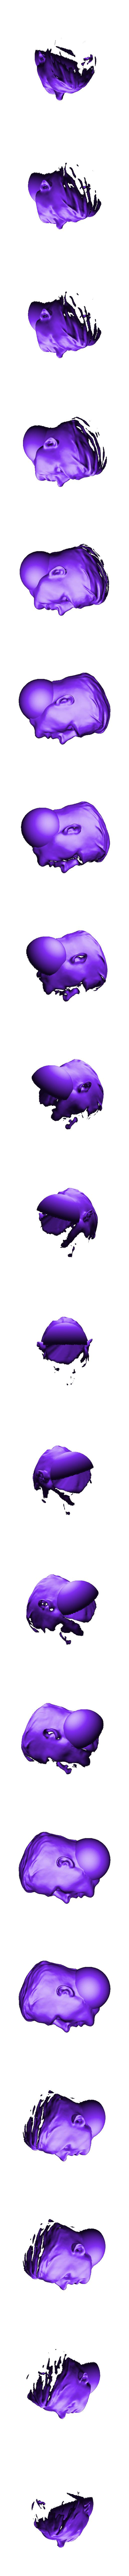 BP1.stl Download free STL file Furioso Bradly Tank Commander • 3D printer model, Valiant_Armory